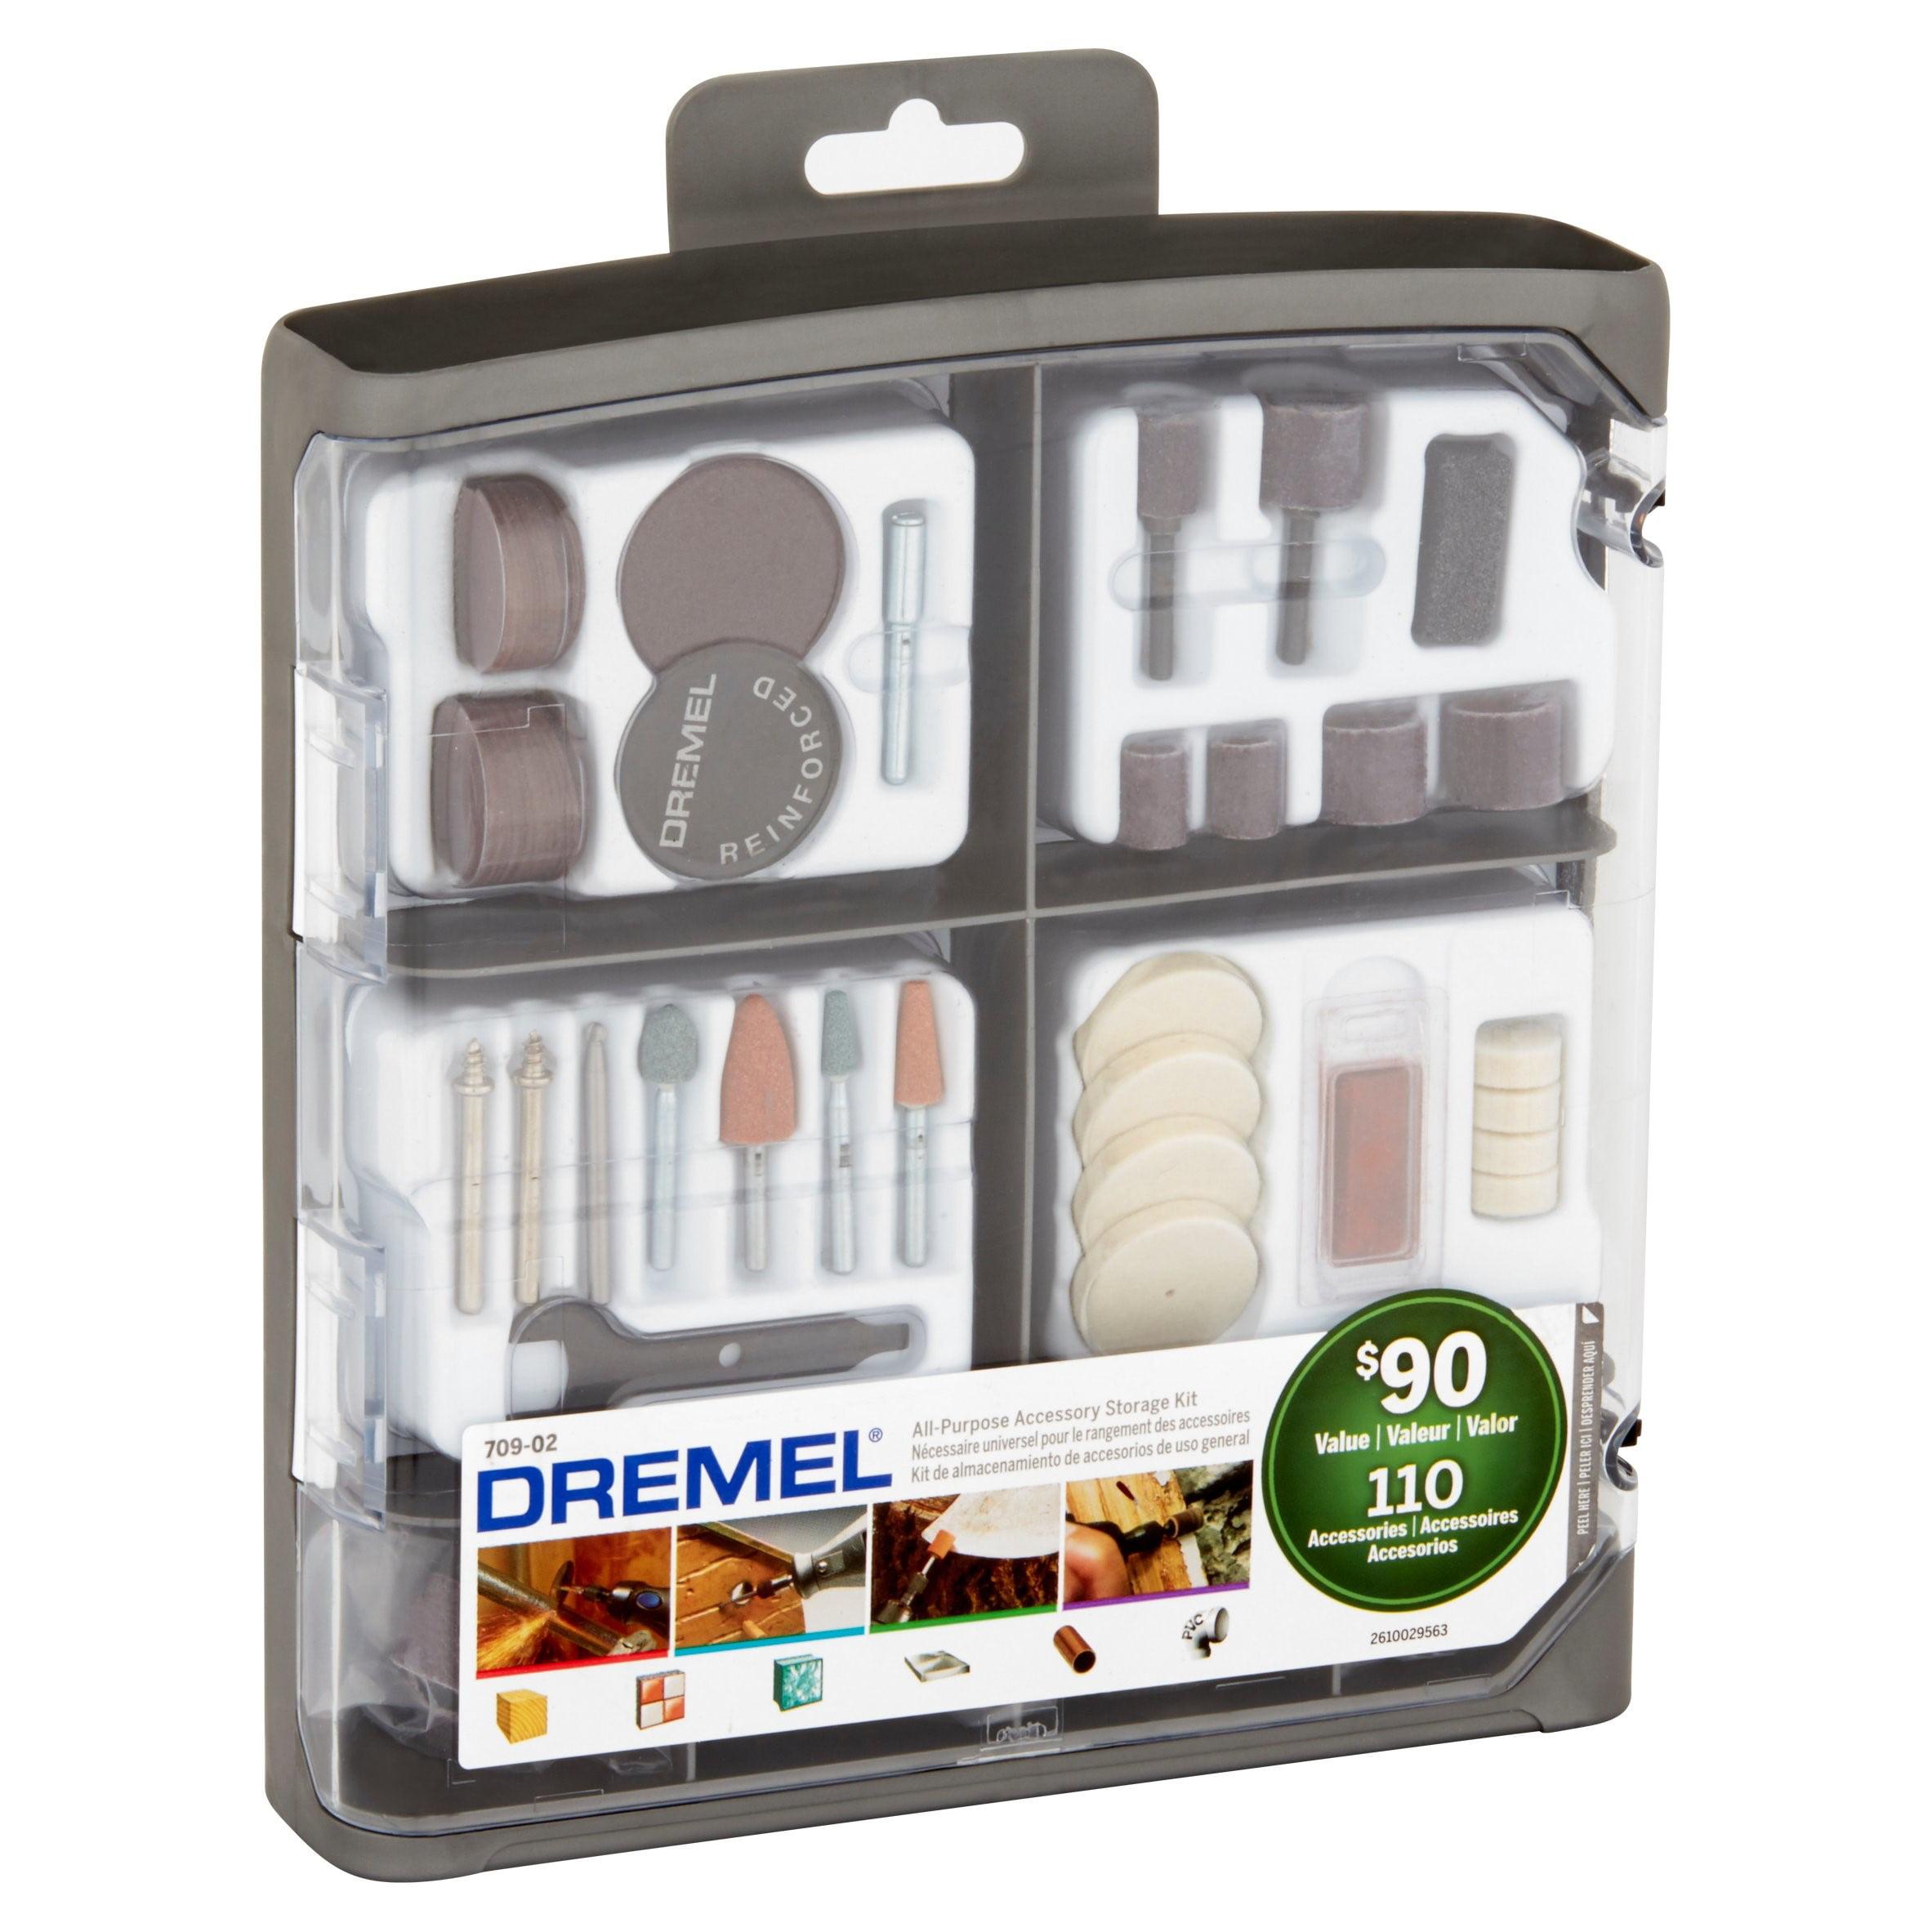 Dremel 709-02 110-Piece All-purpose Accessory Storage Kit